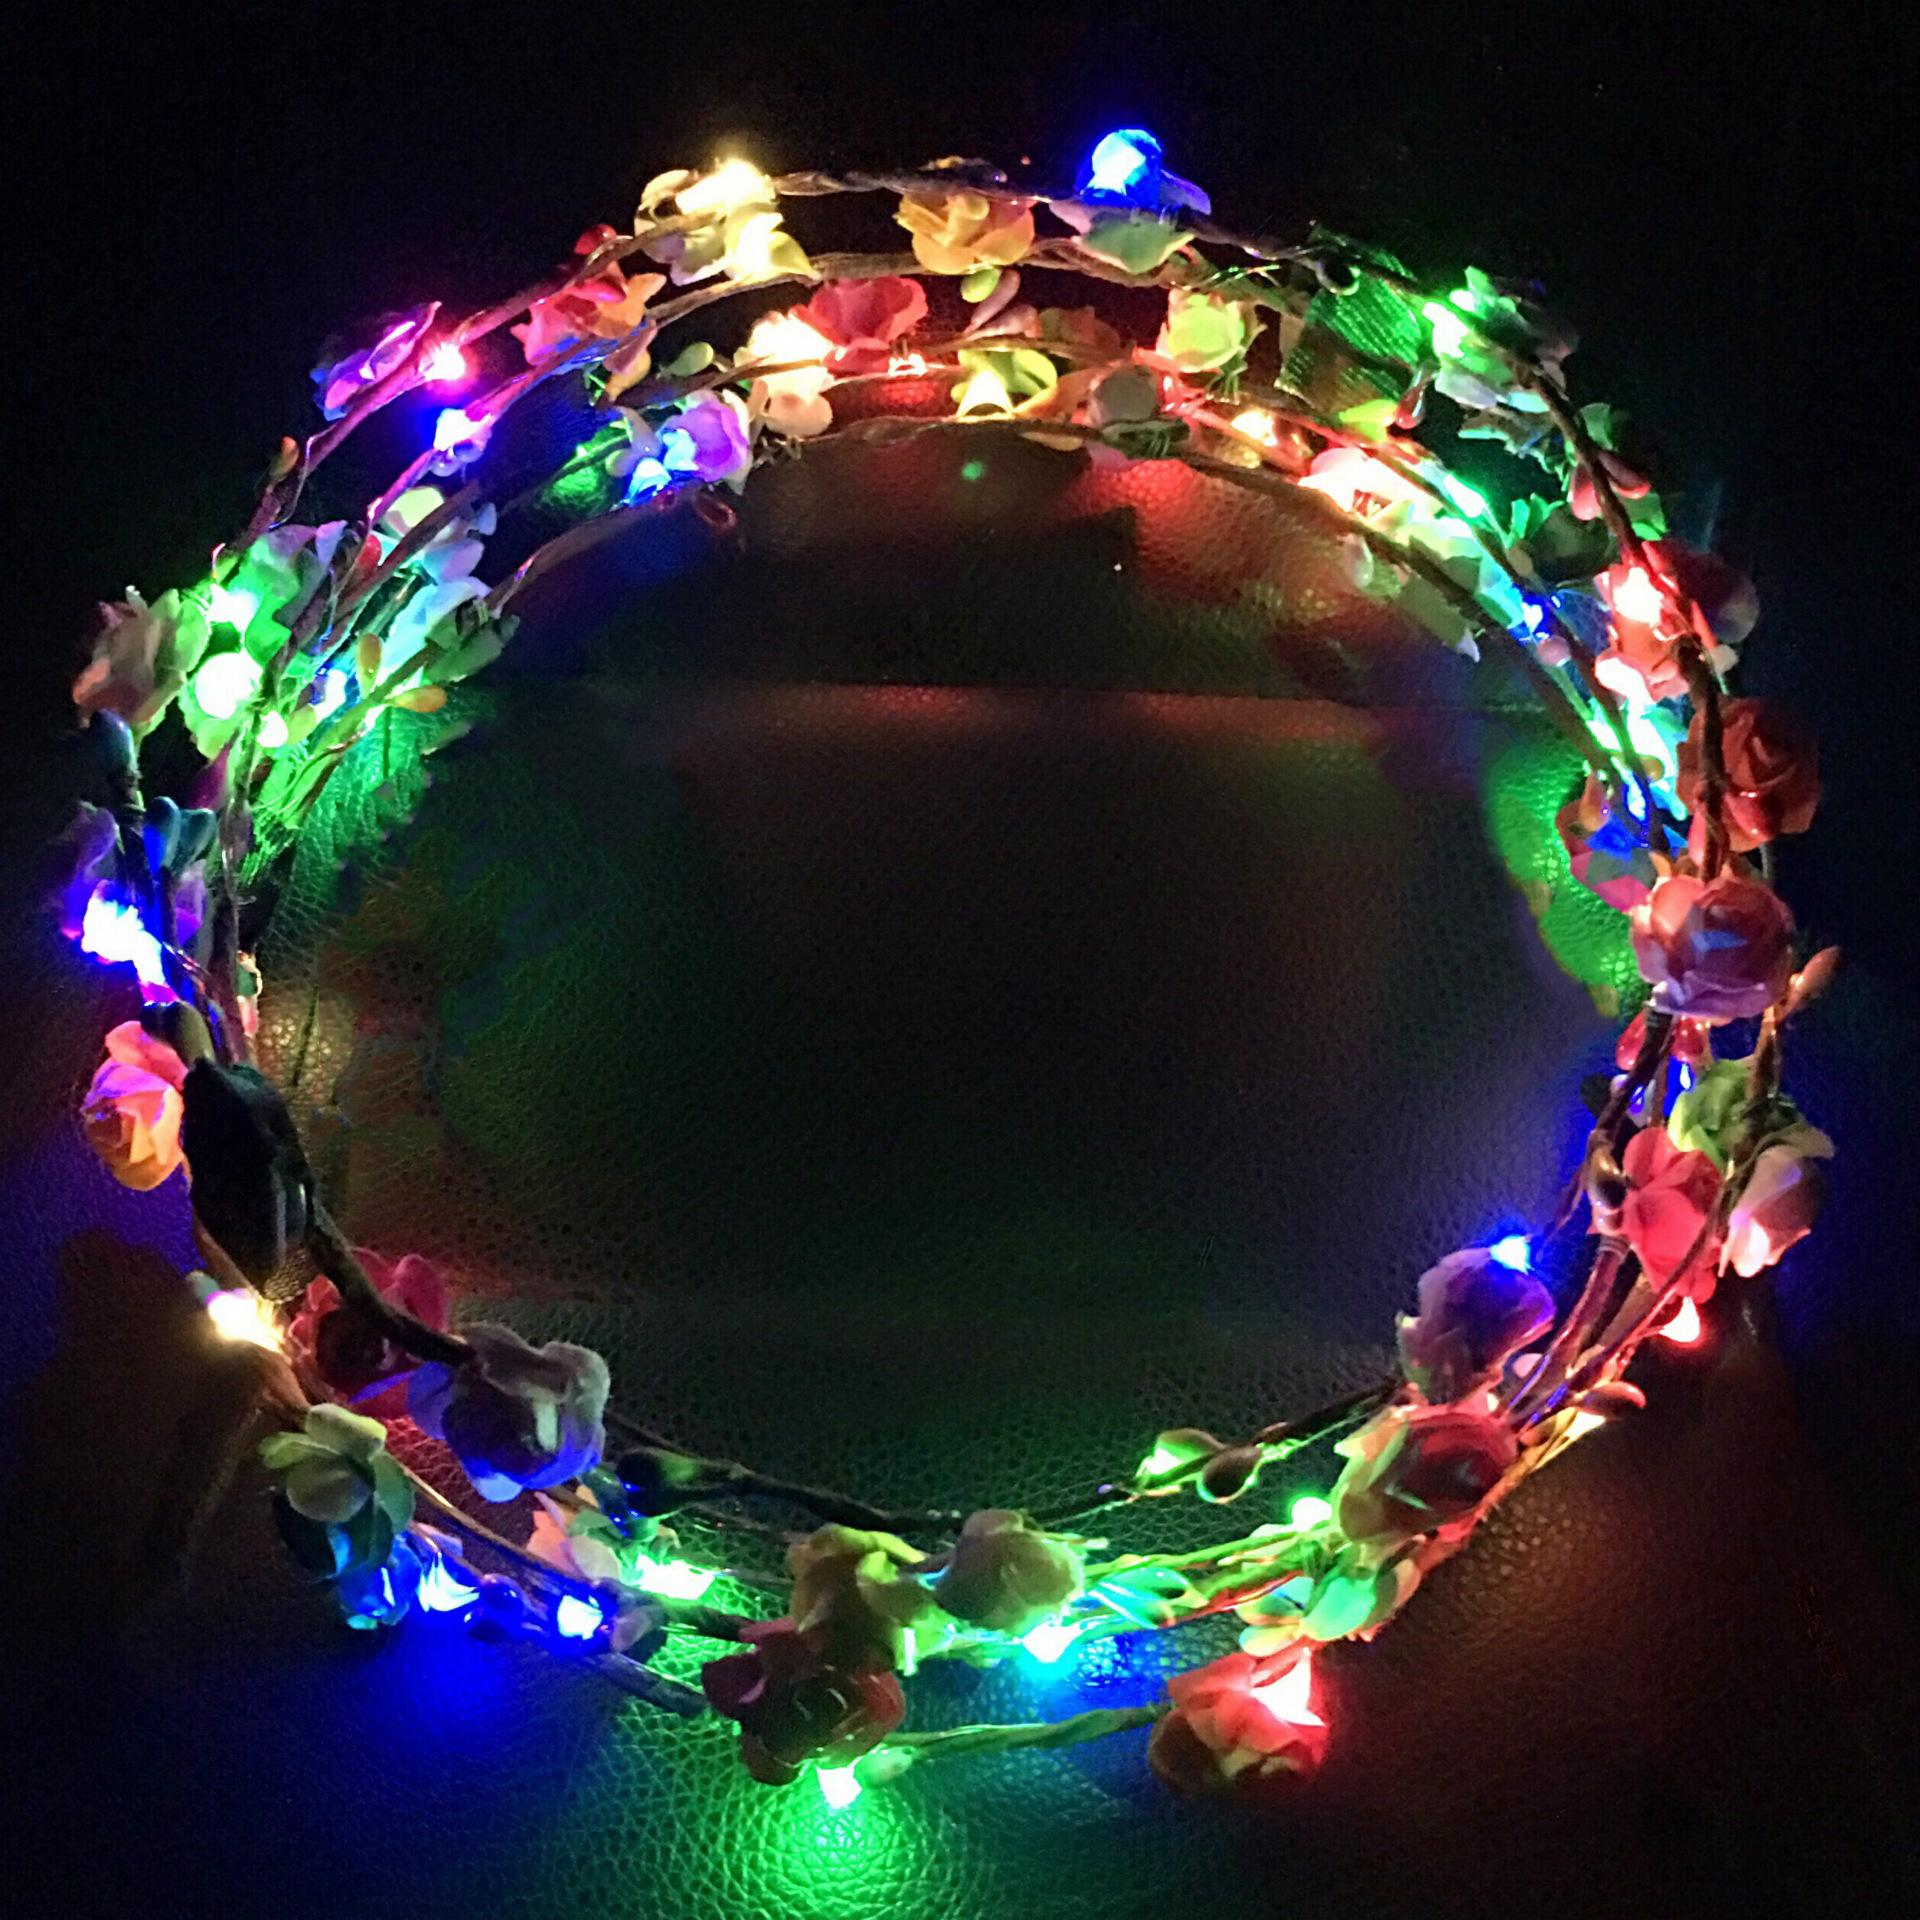 light colorful lights on the beach garland wreath headdress spots